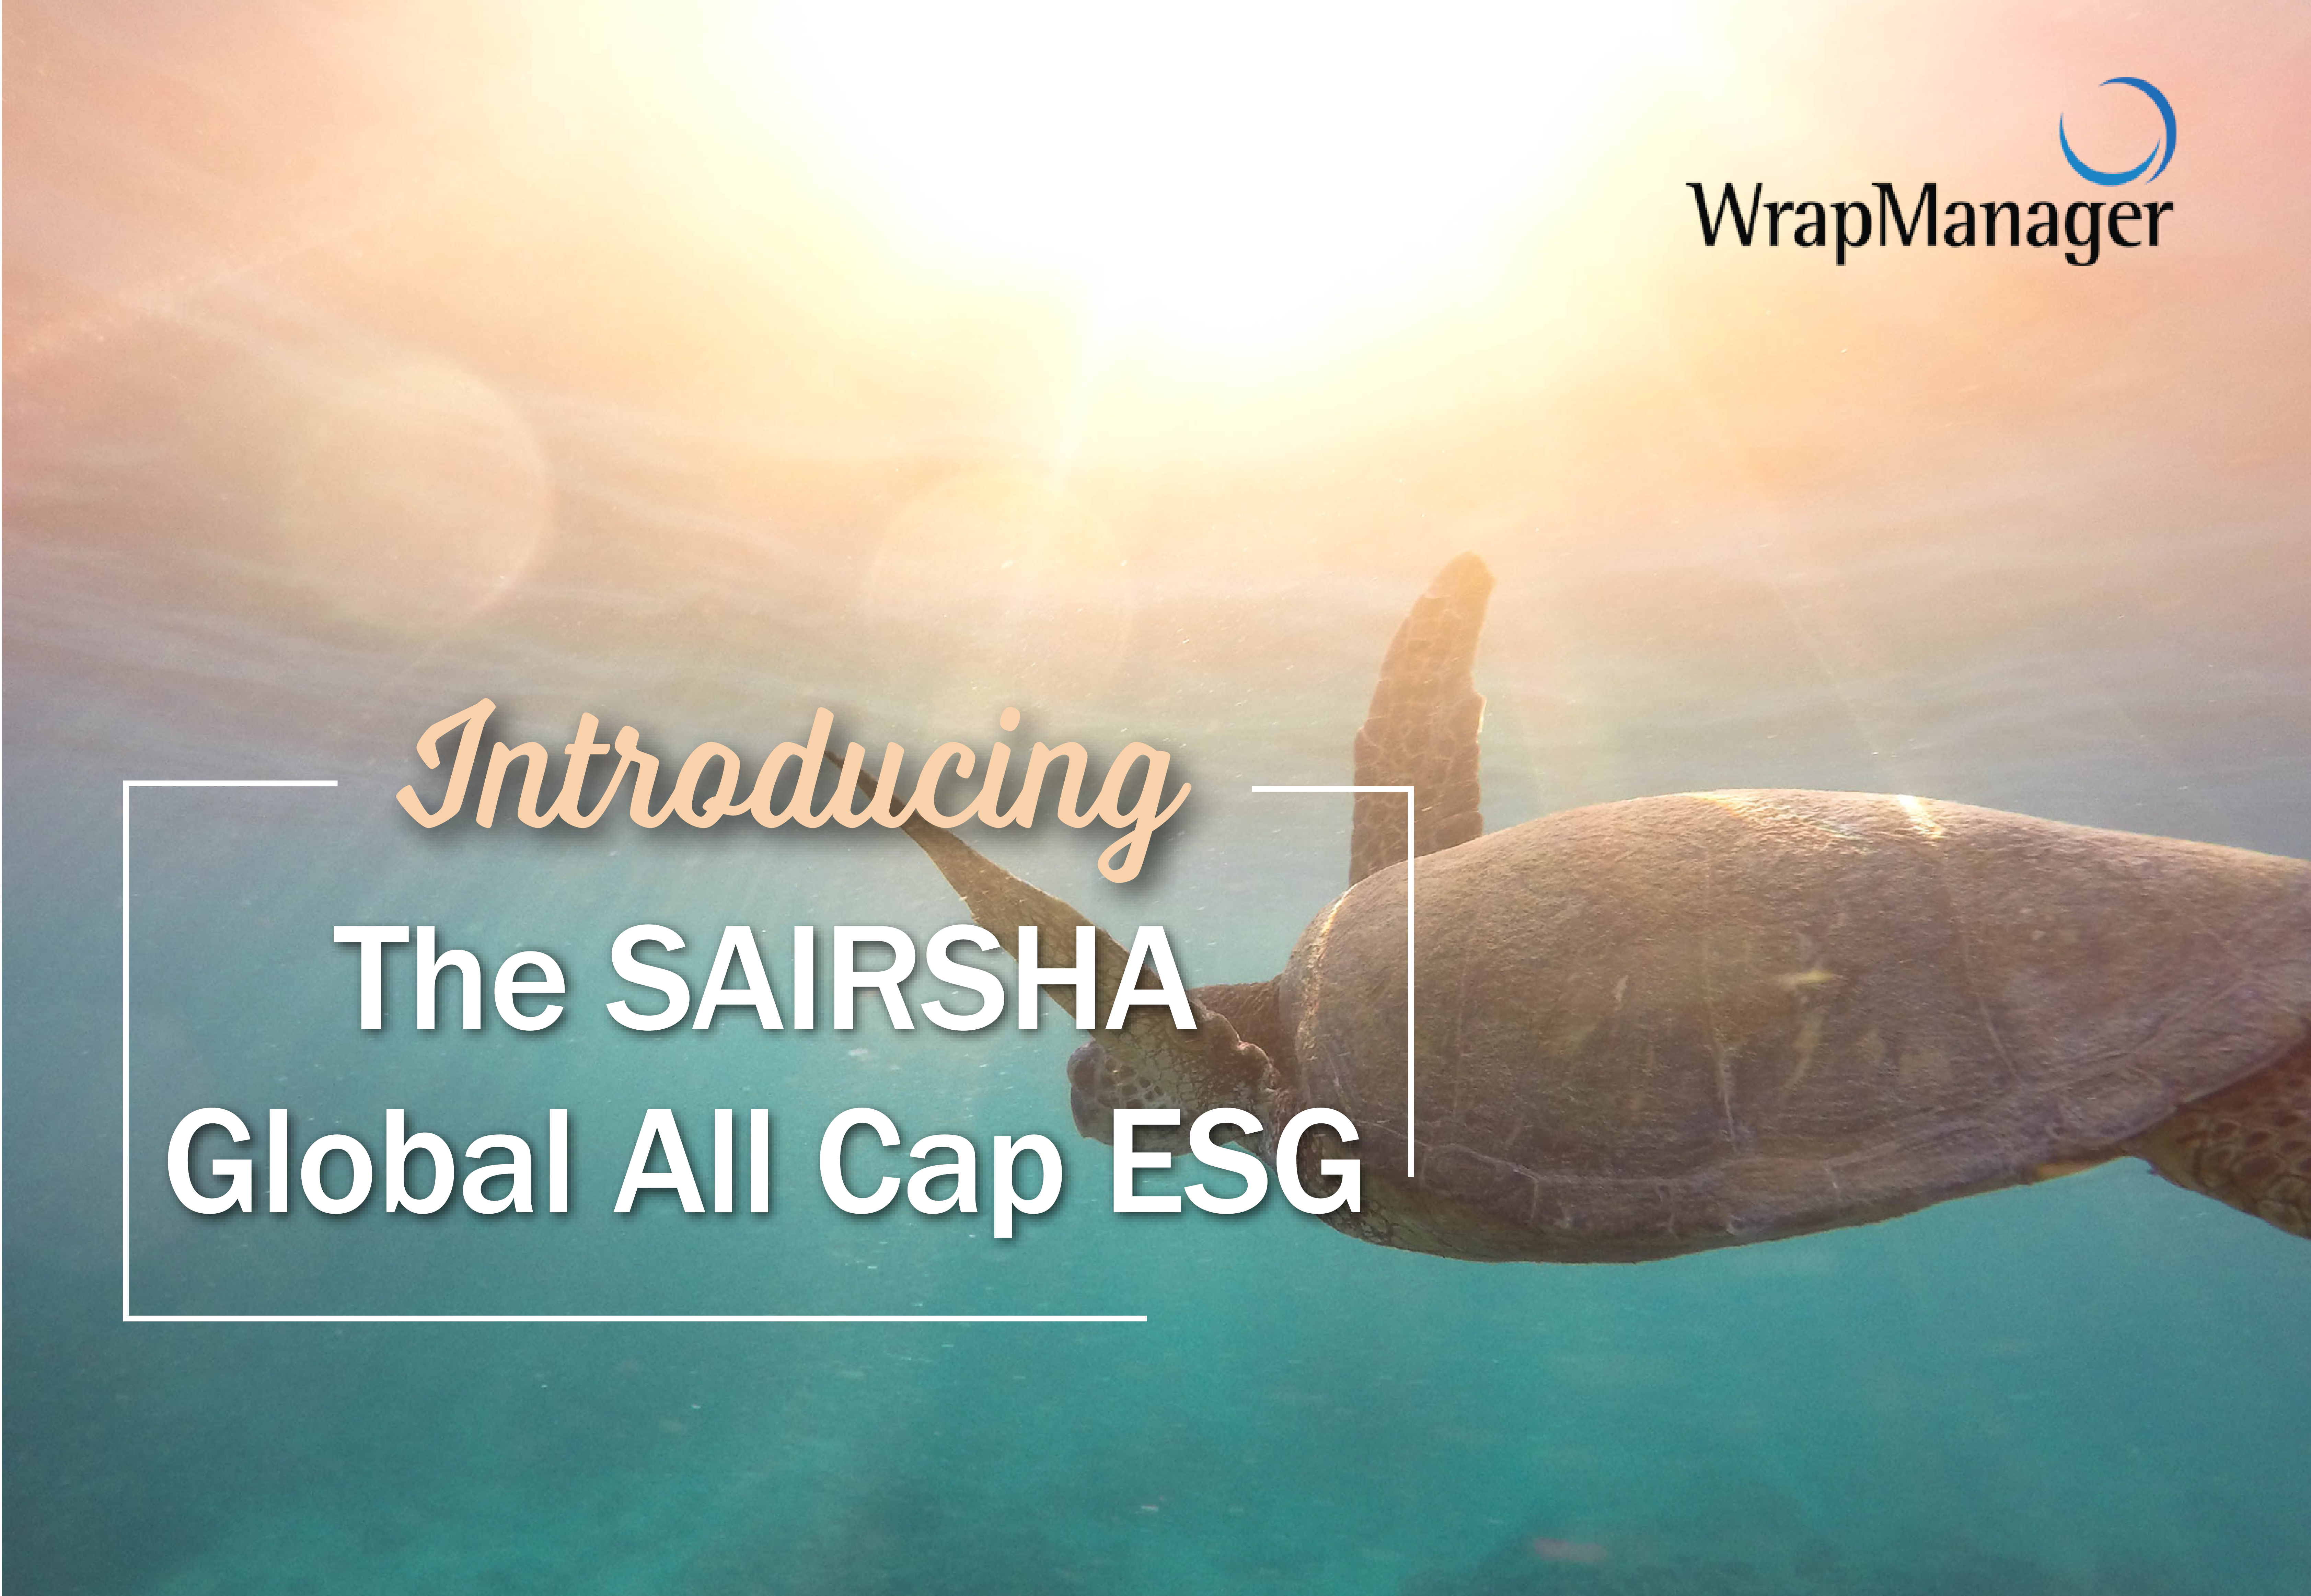 Introducing the WrapManager SAIRSHA Global All Cap ESG Portfolio